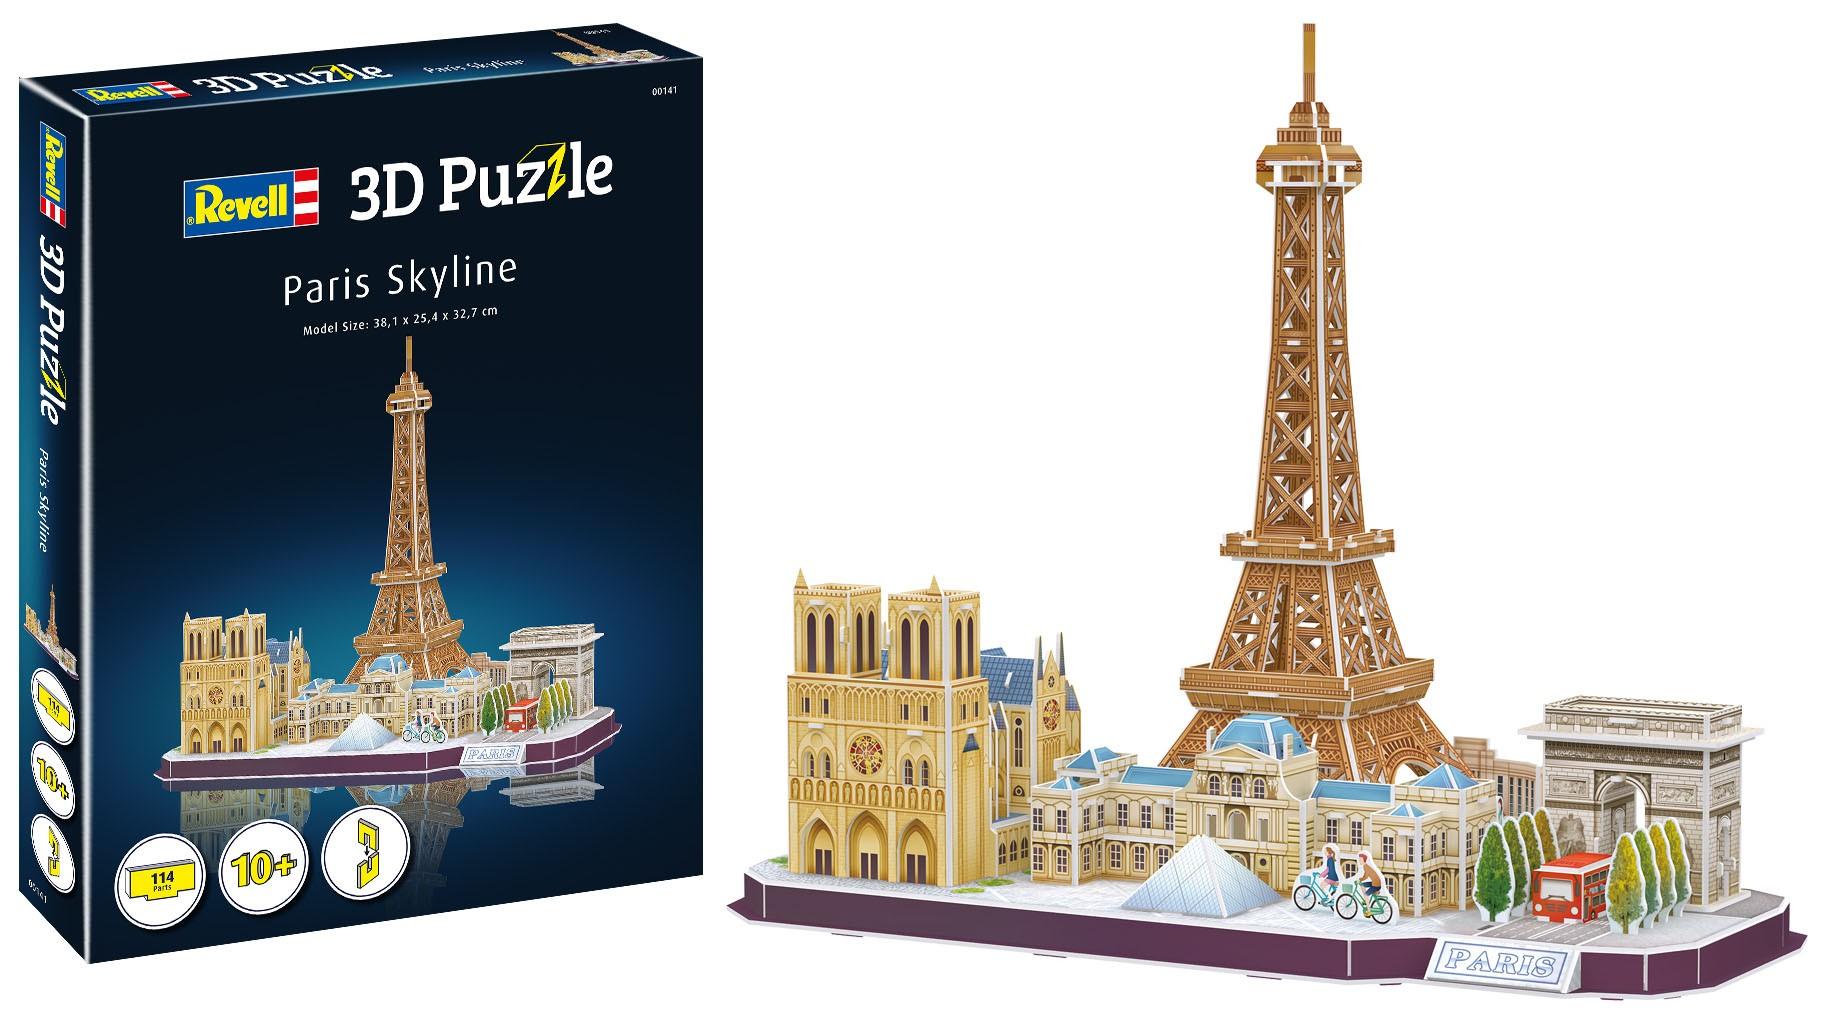 Quebra-cabeça 3D (3D Puzzle) Paisagens de Paris - Revell 00141  - BLIMPS COMÉRCIO ELETRÔNICO